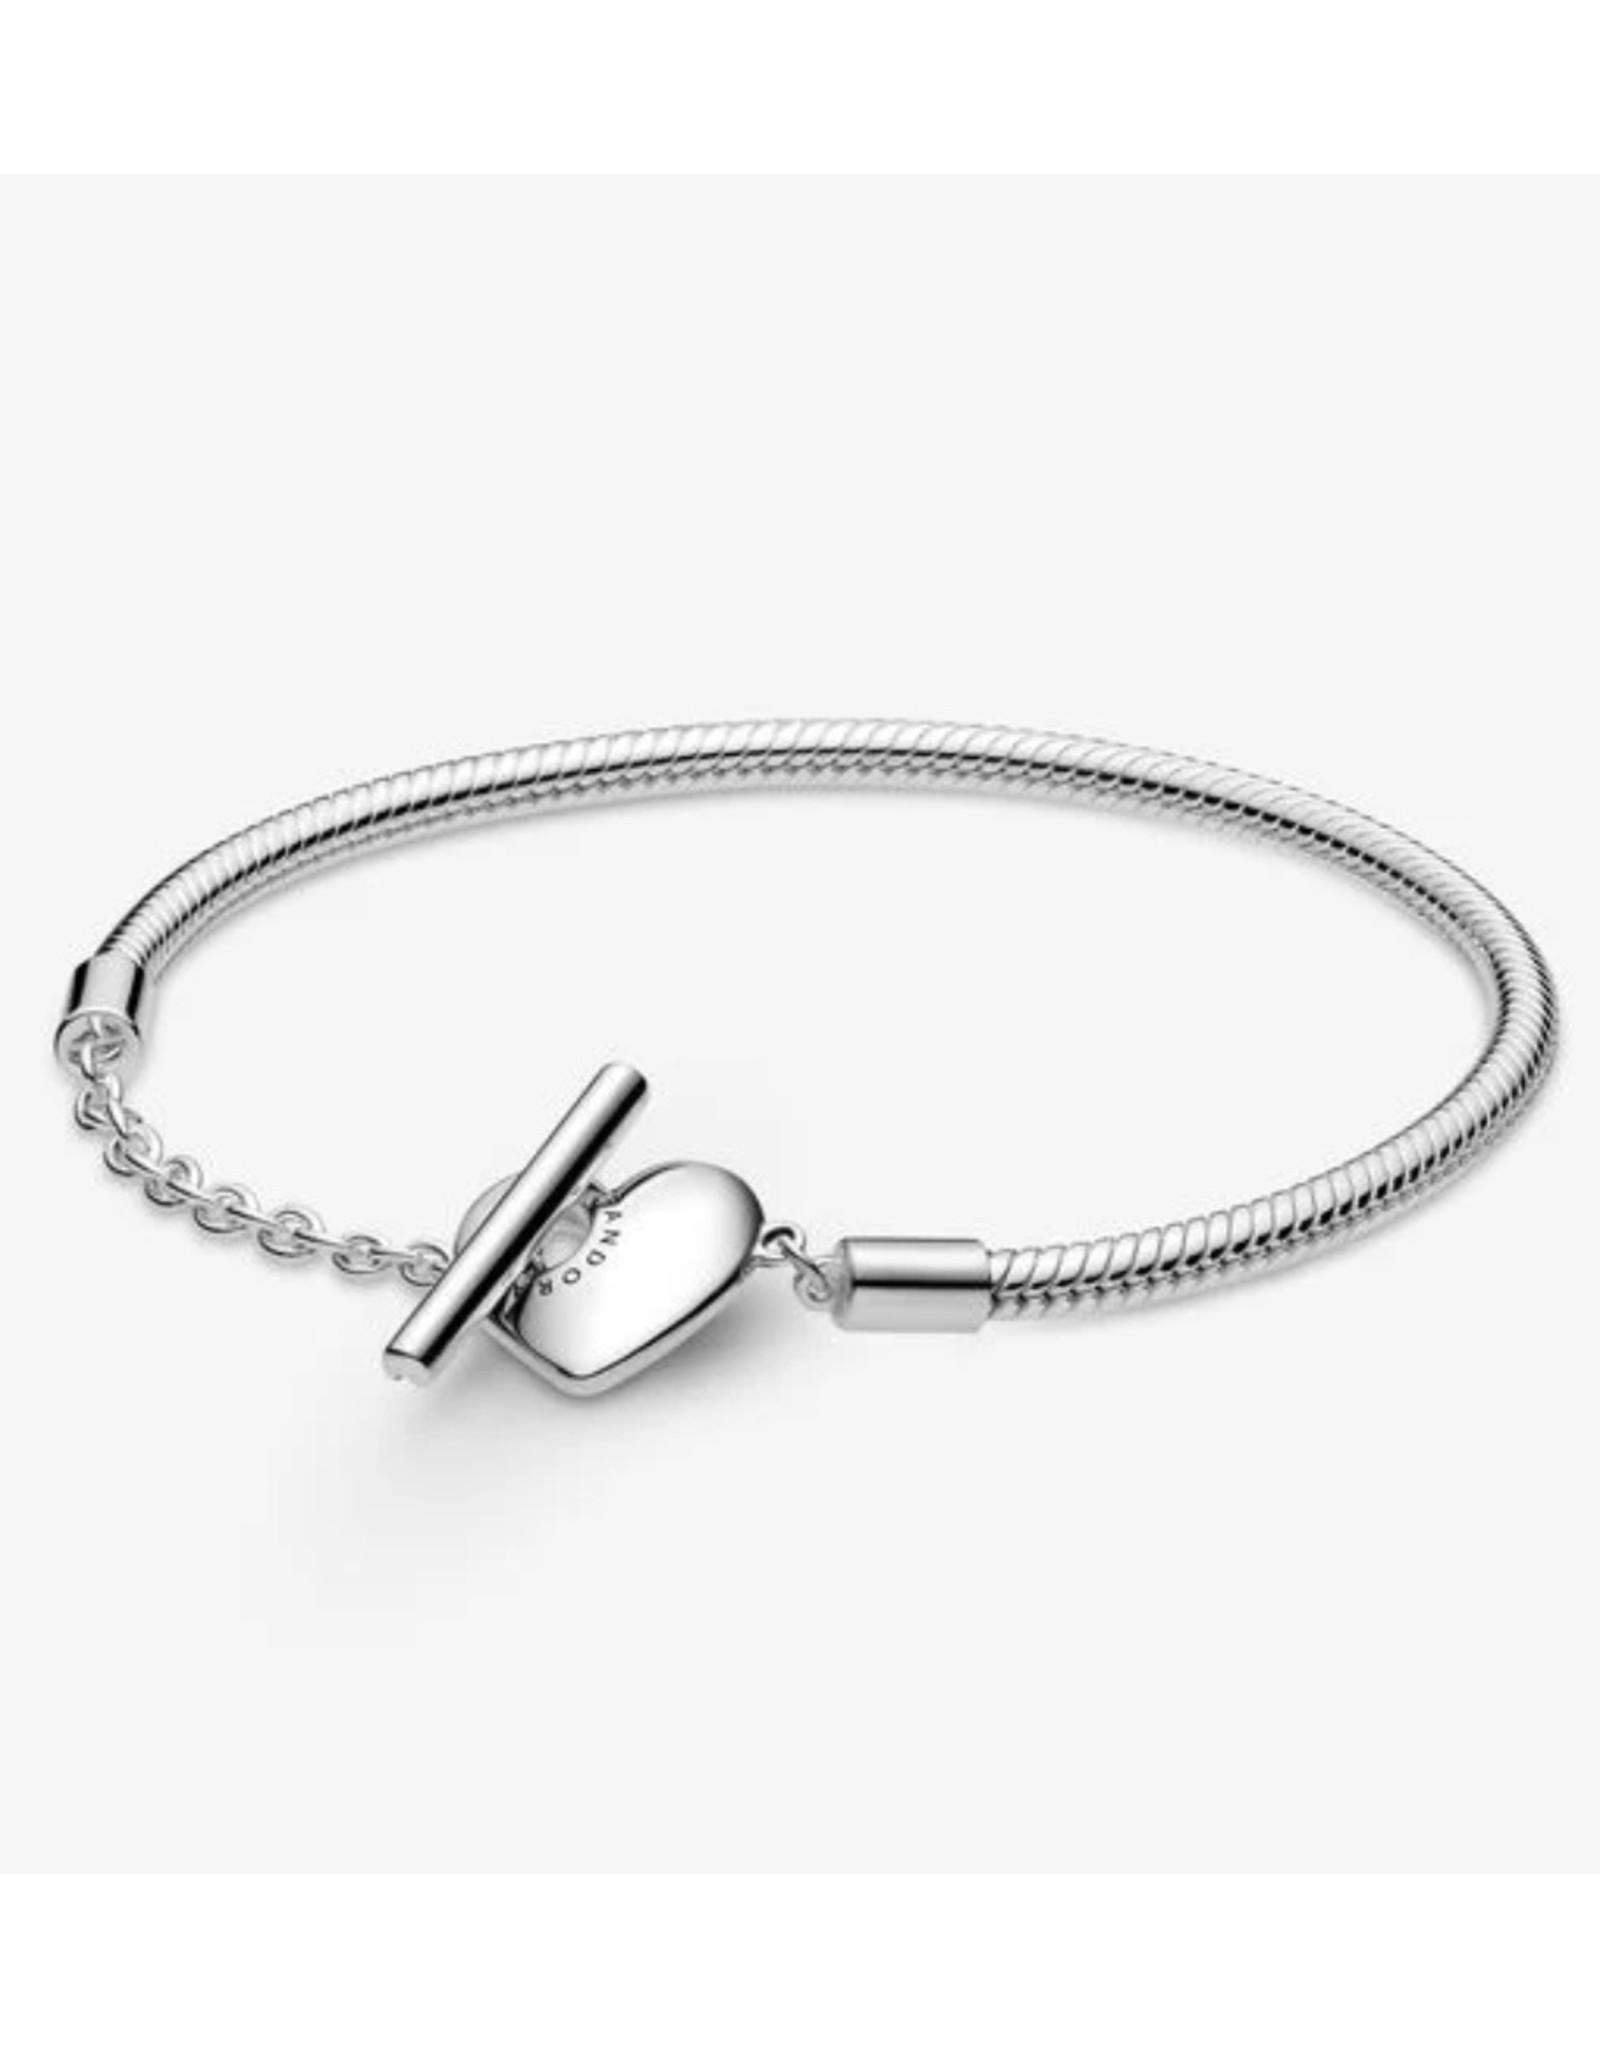 Pandora Pandora Bracelet,599285C00,Engravable Heart T-Bar Snake Chain